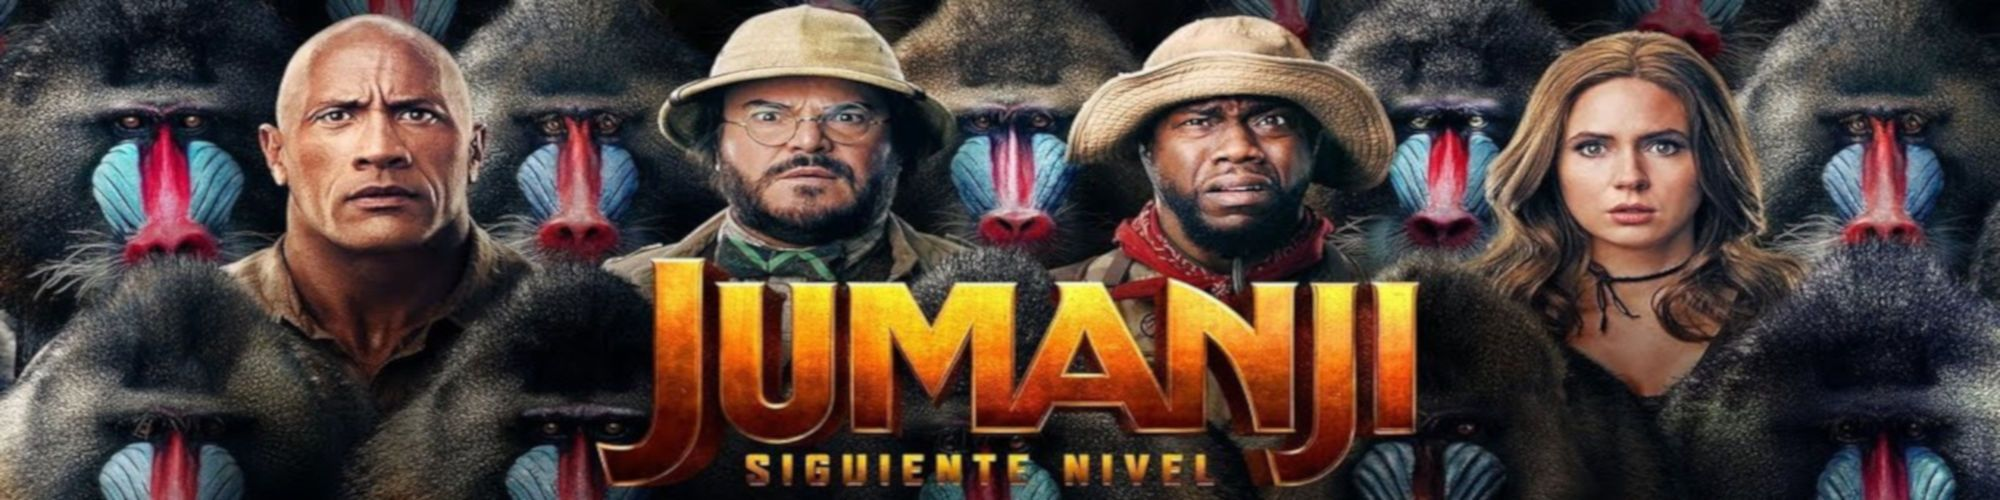 JUMANJI Siguiente Nivel (Banner Superior)